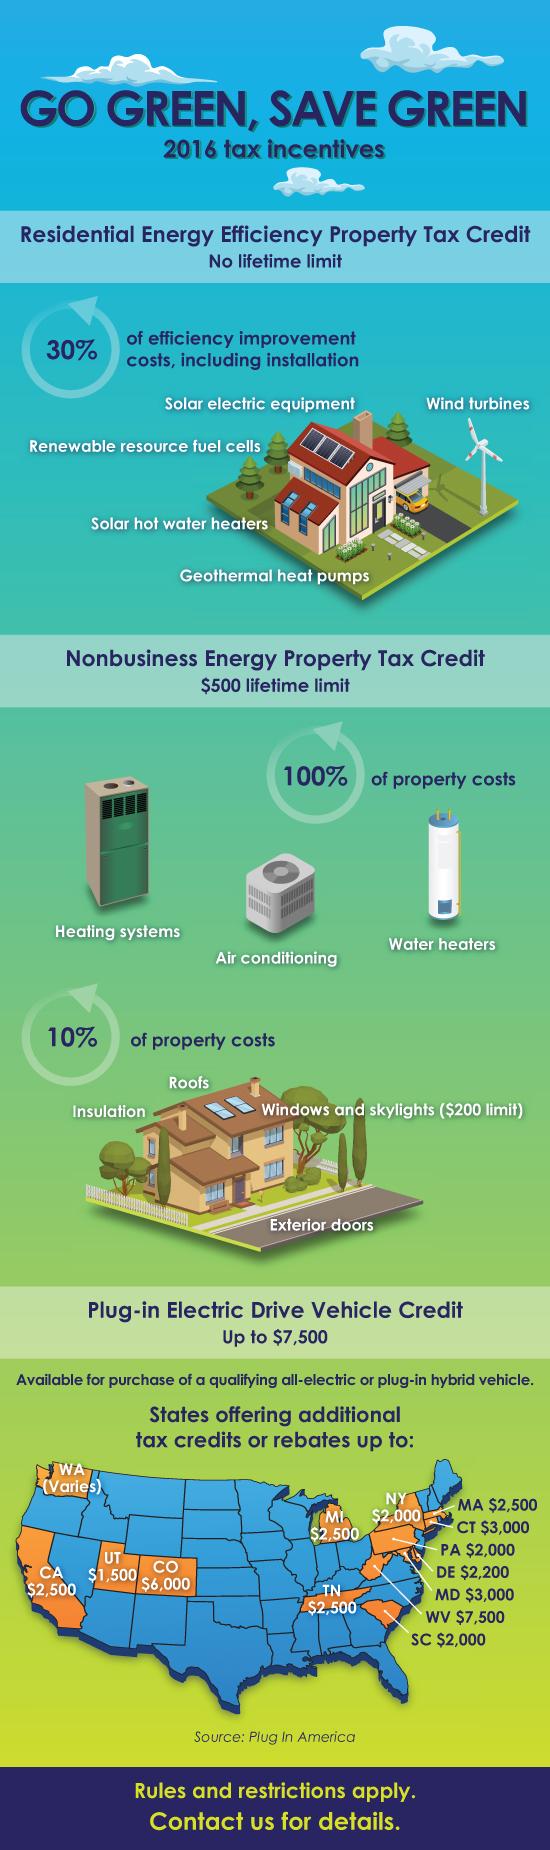 2016 Tax Incentives